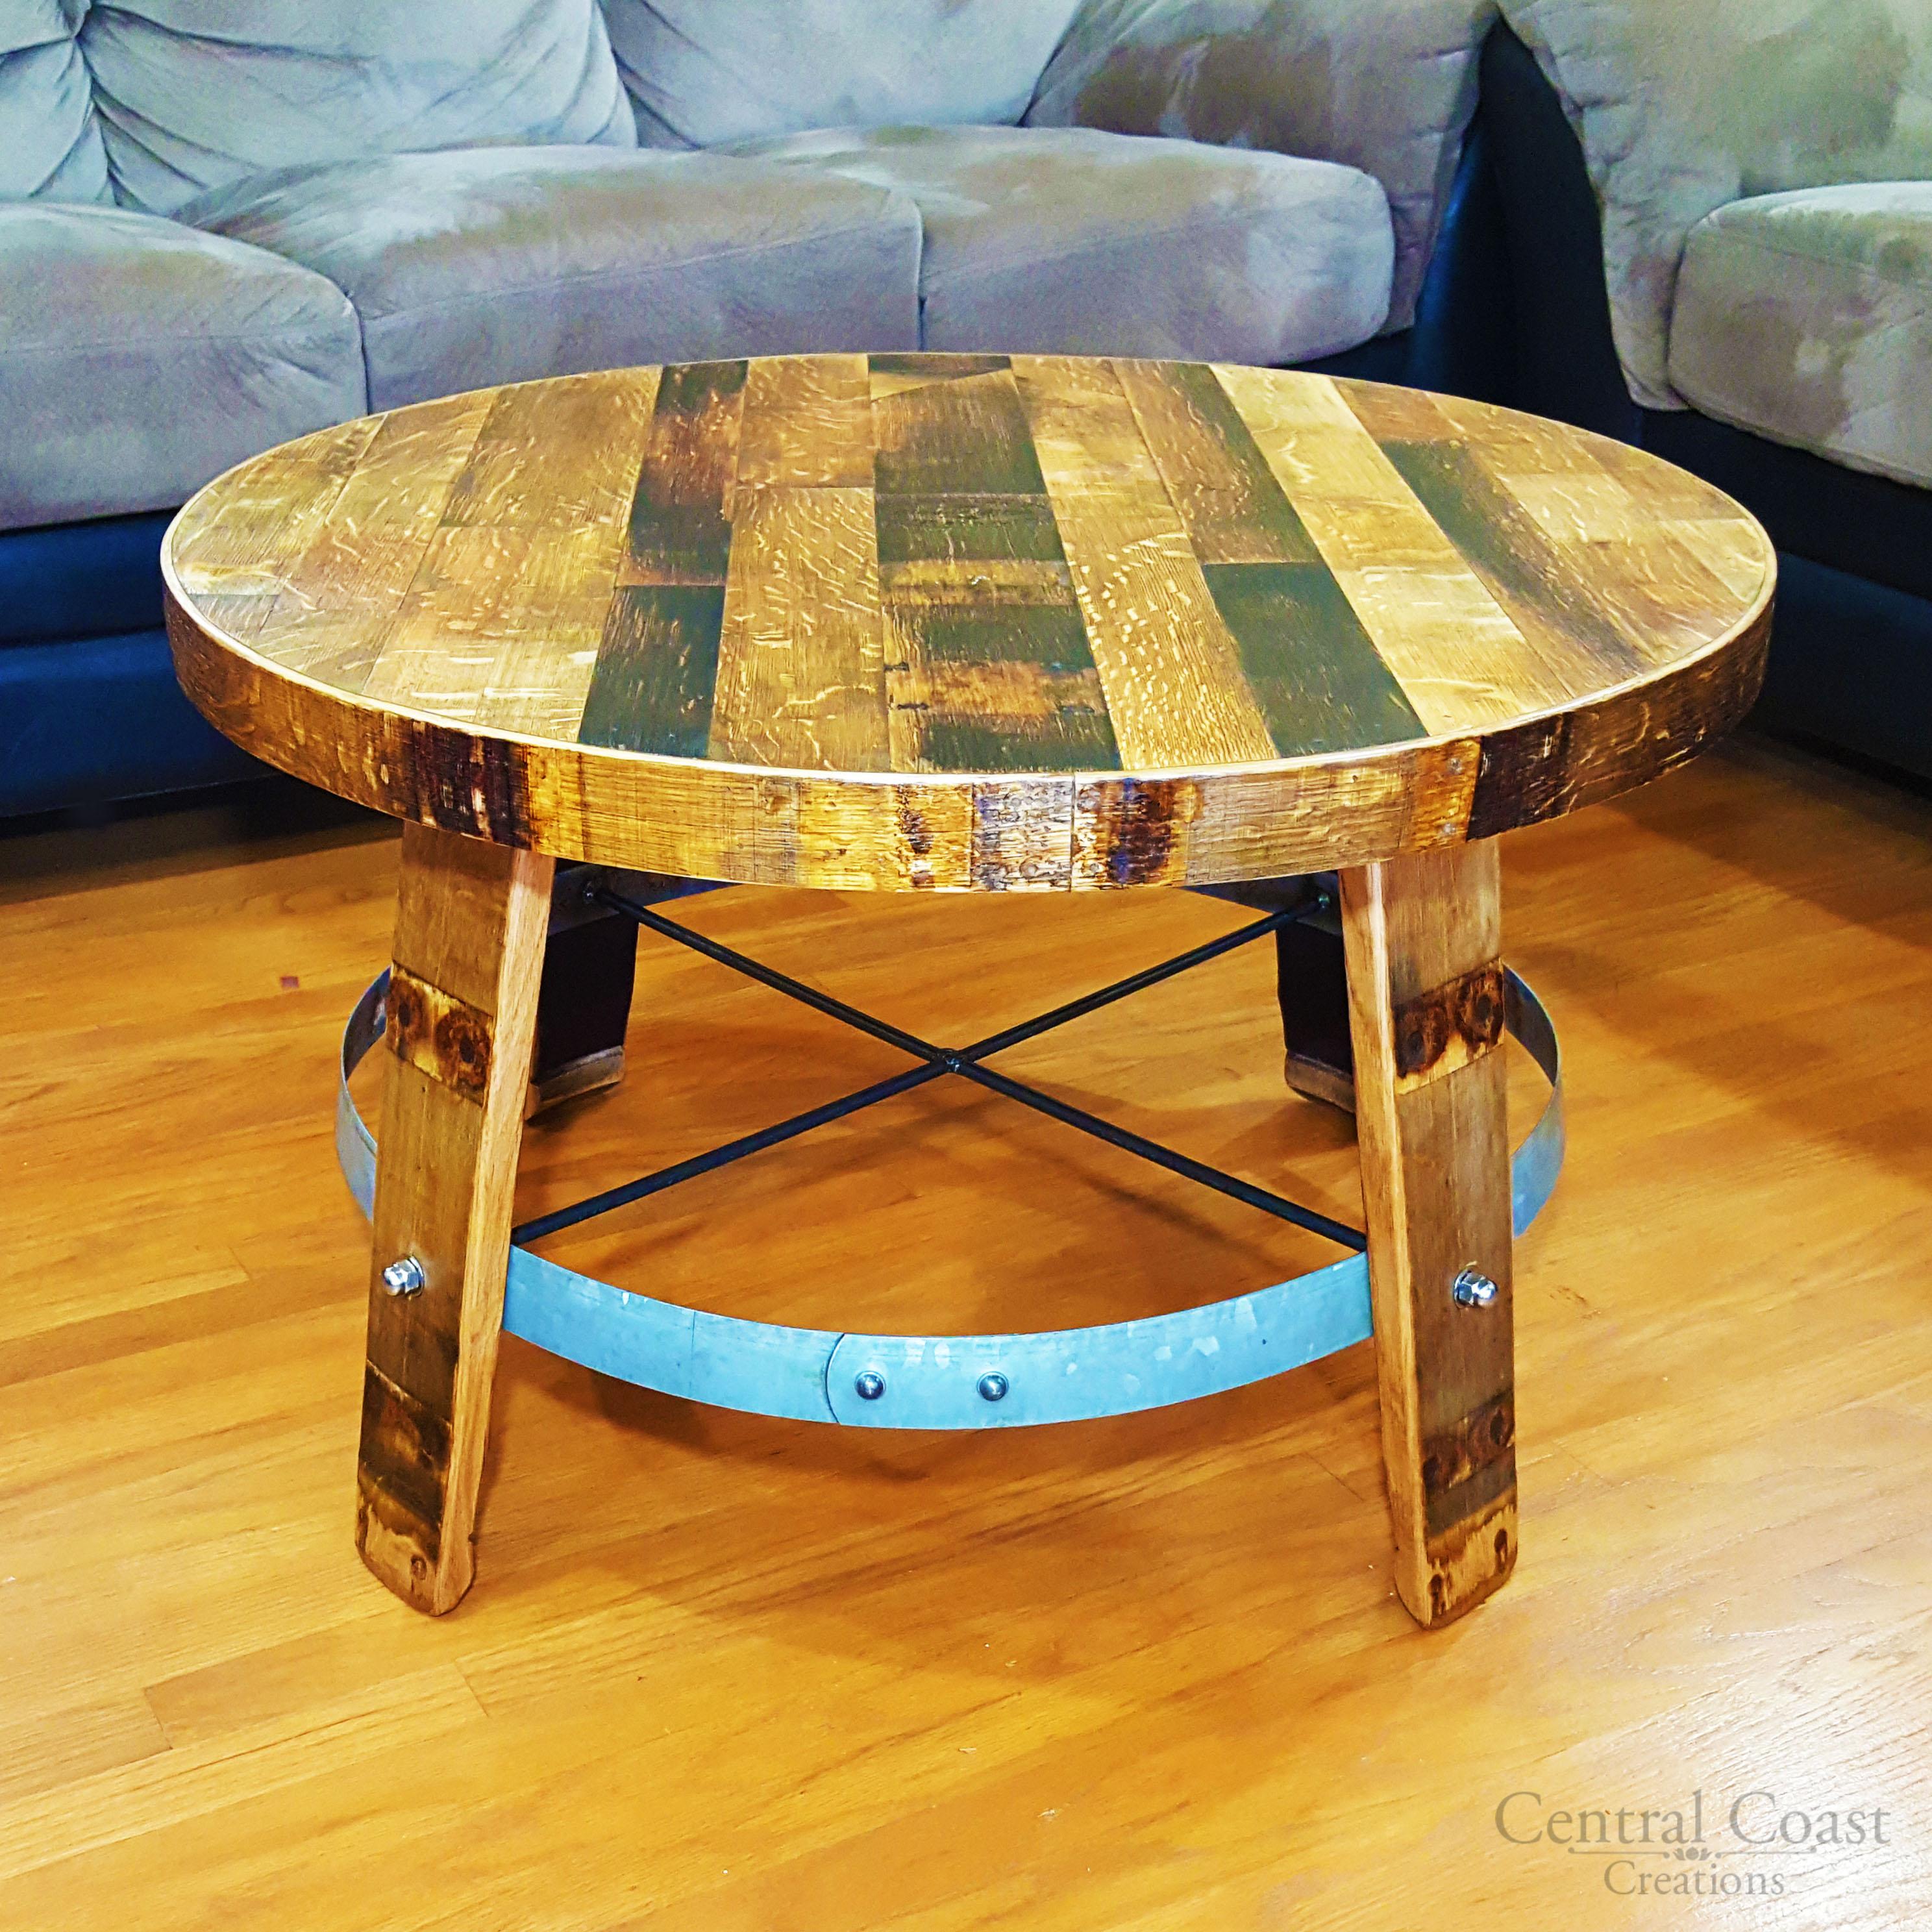 Wine barrel head center coffee table home rustic furniture for Center coffee table furniture